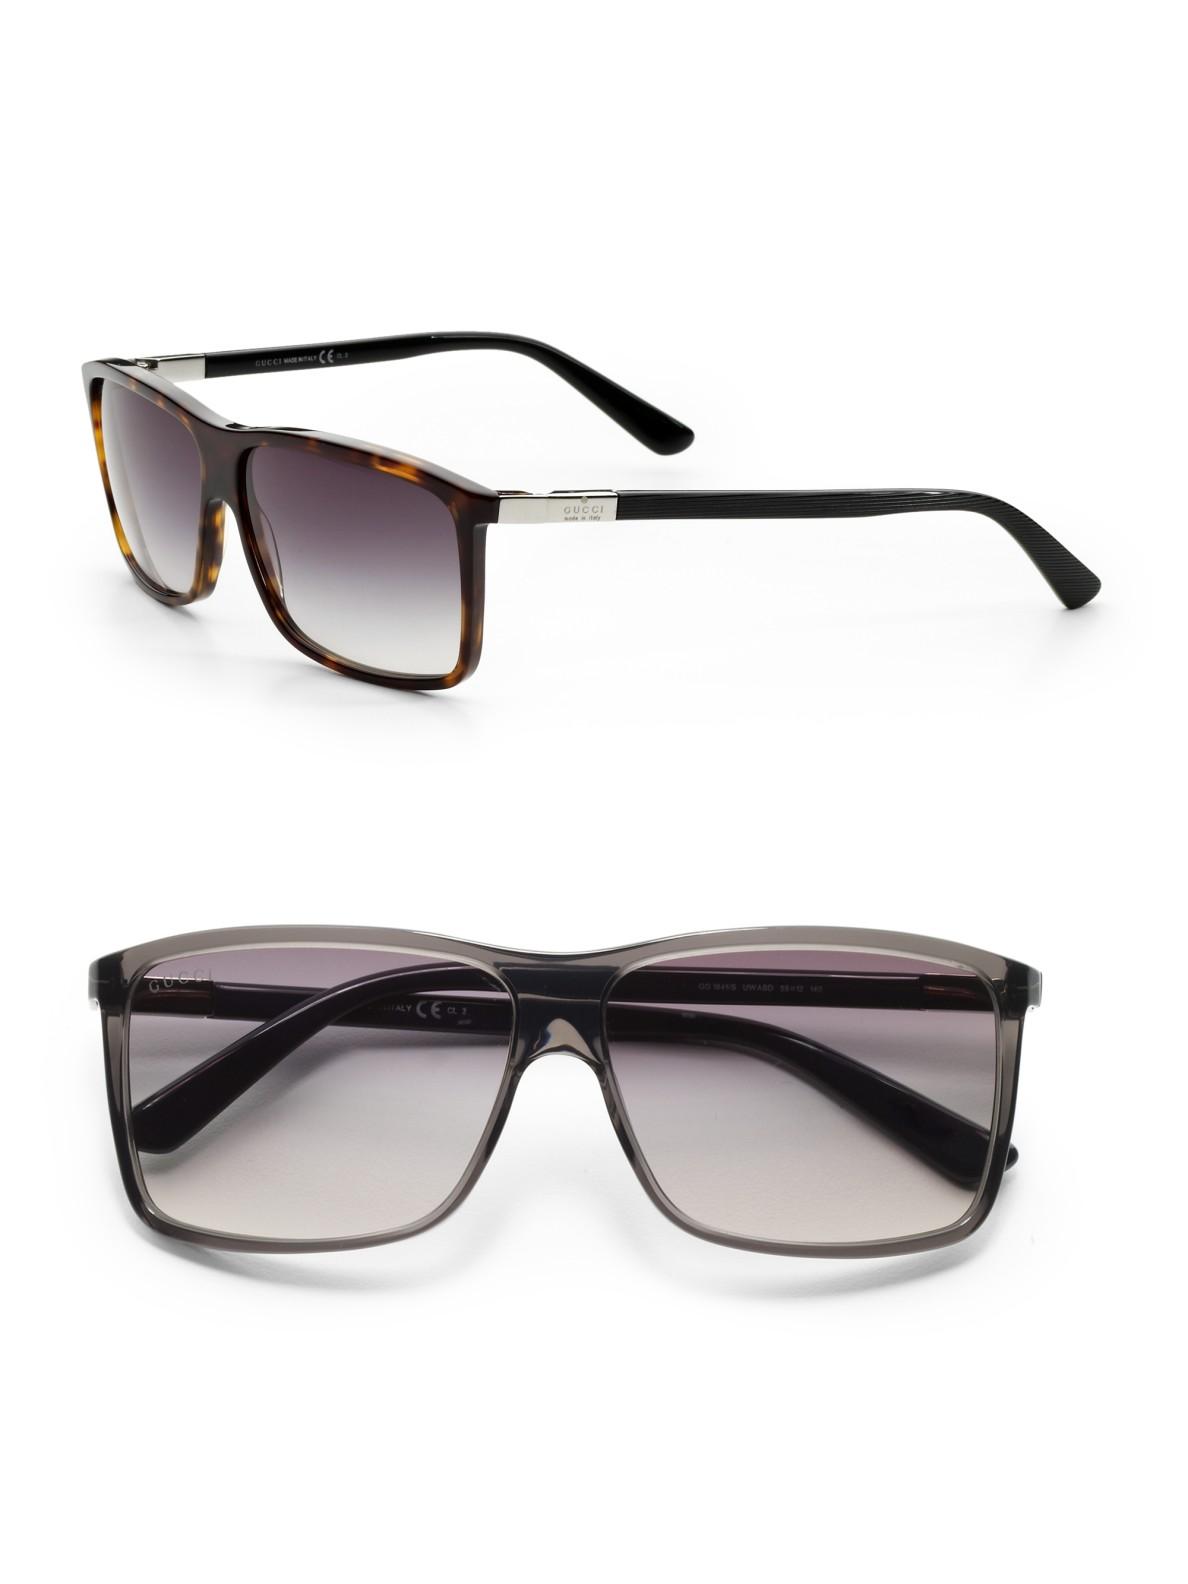 Gucci Wayfarer Sunglasses In Brown For Men Lyst